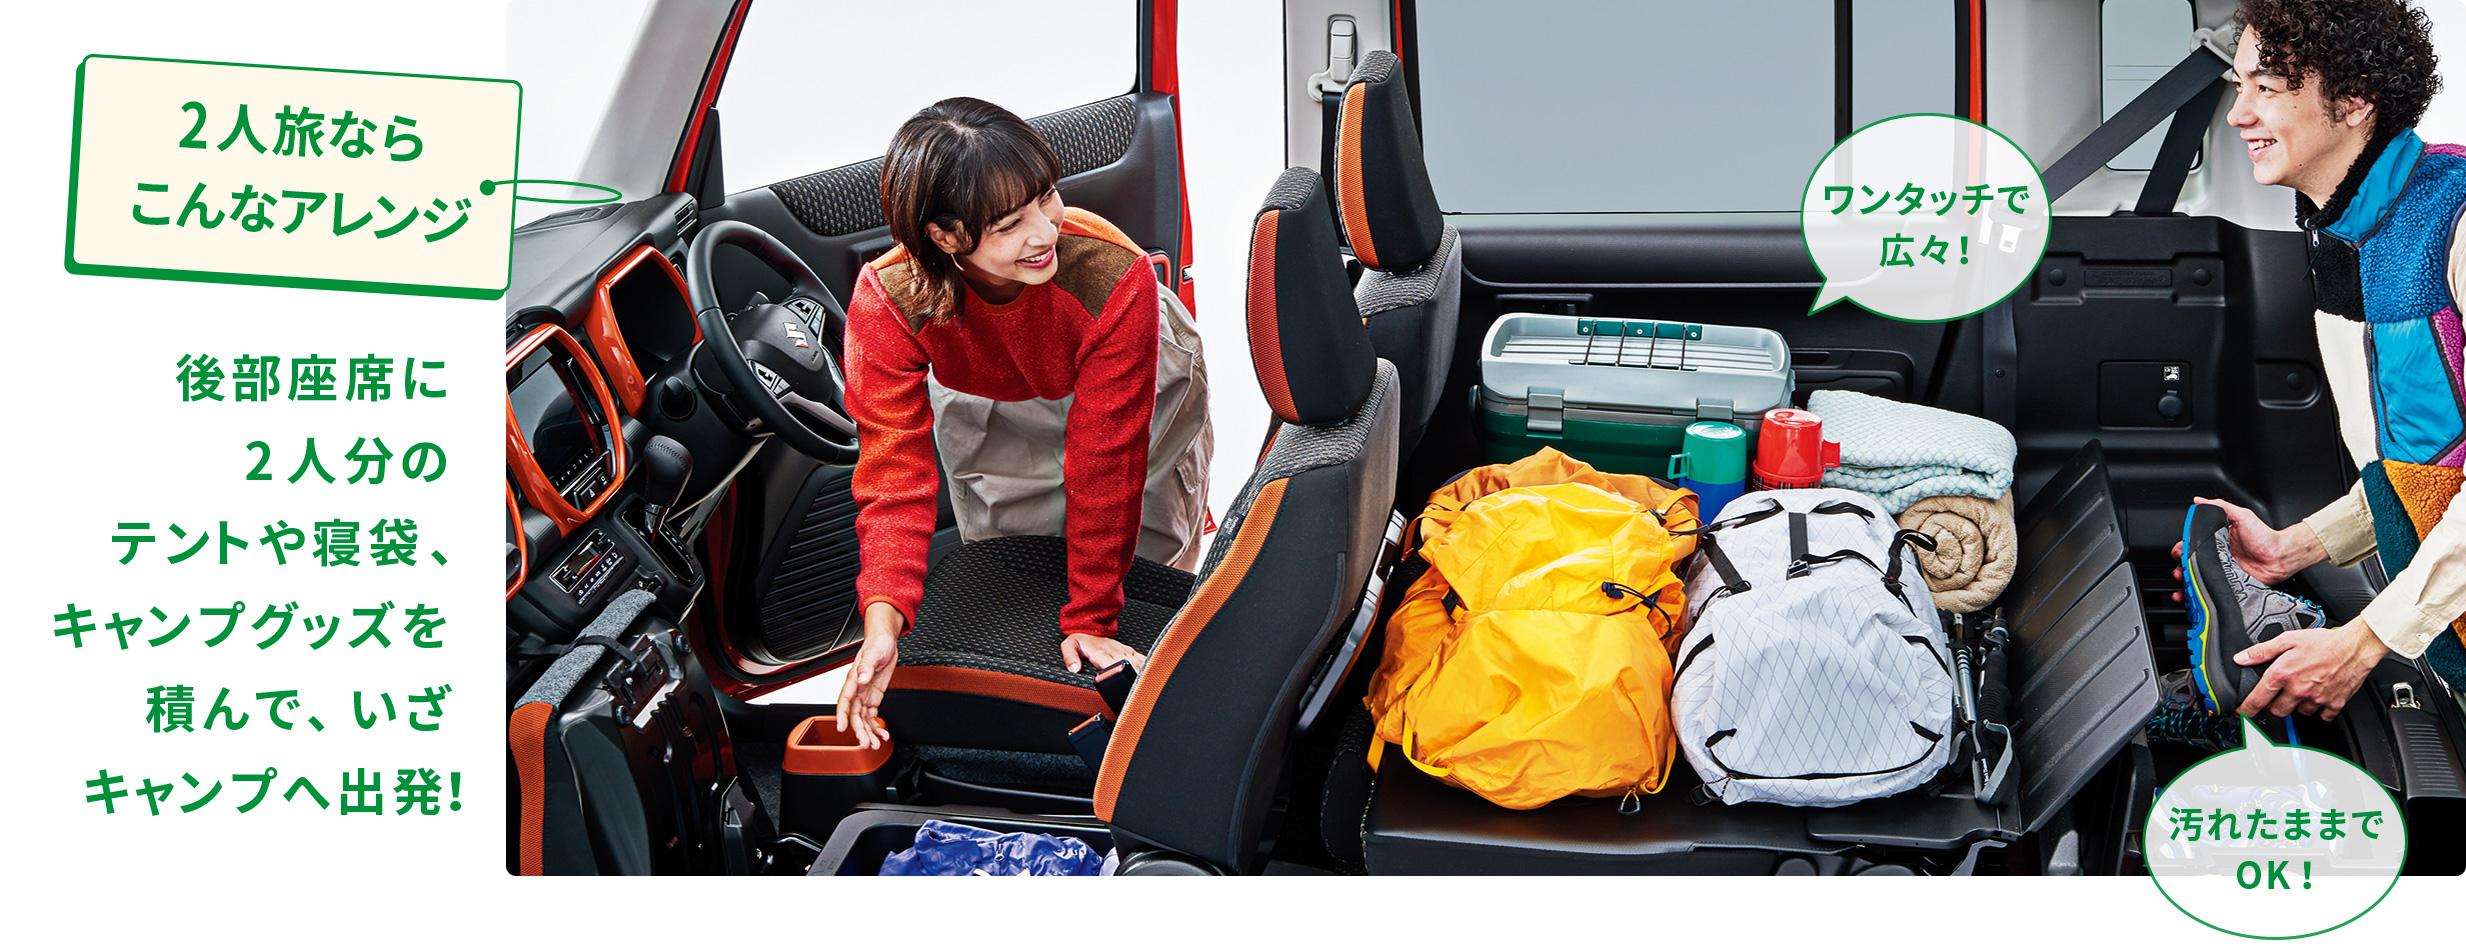 http://www.suzuki.co.jp/car/hustler/interior/img/img07.jpg